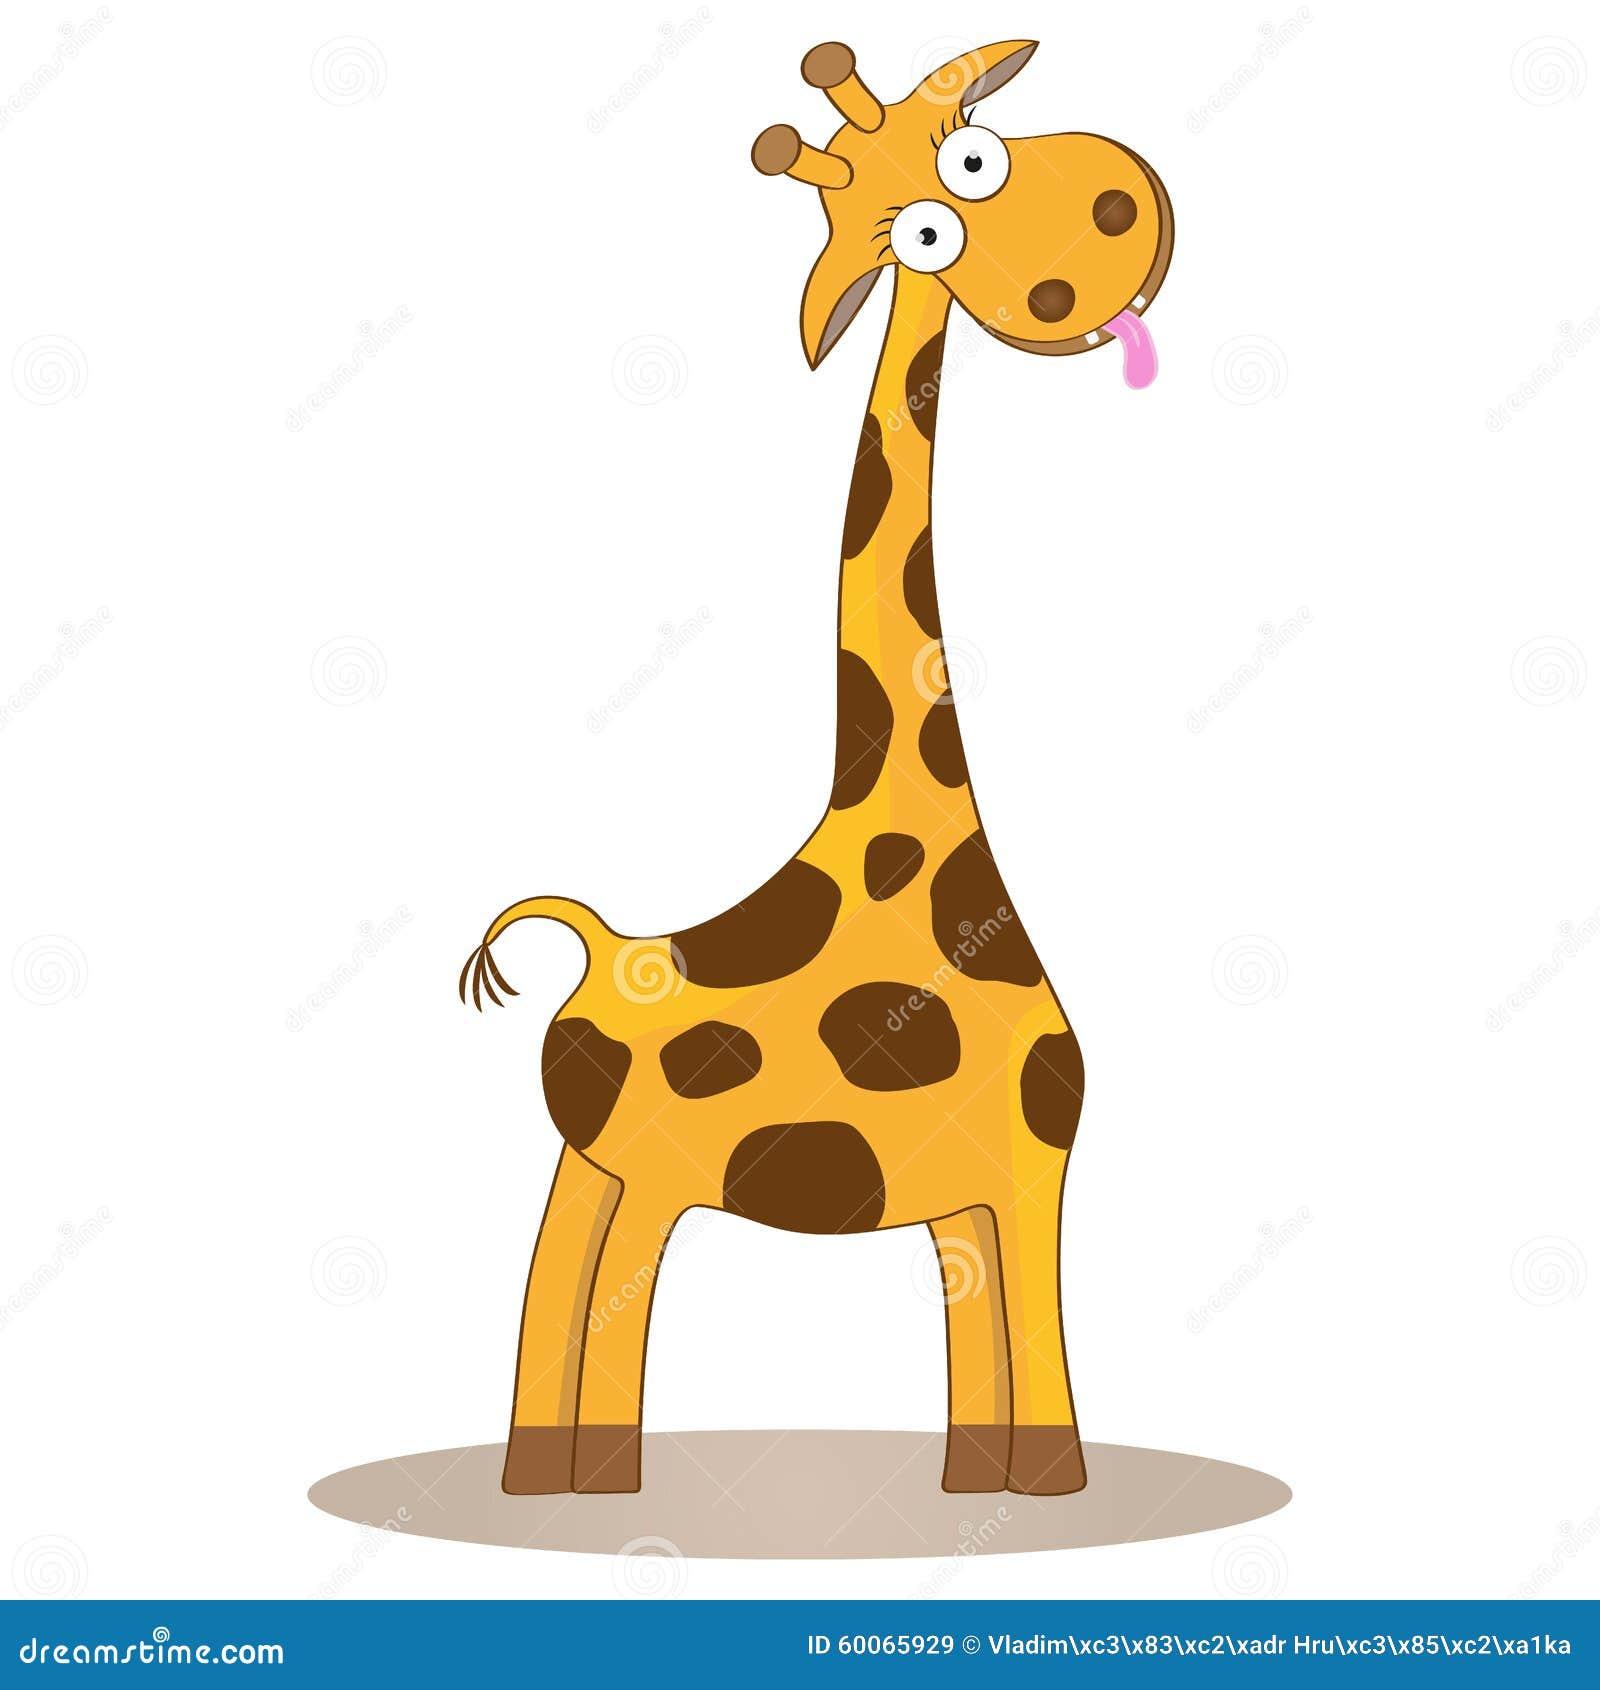 Funny giraffe cartoon meme - photo#39